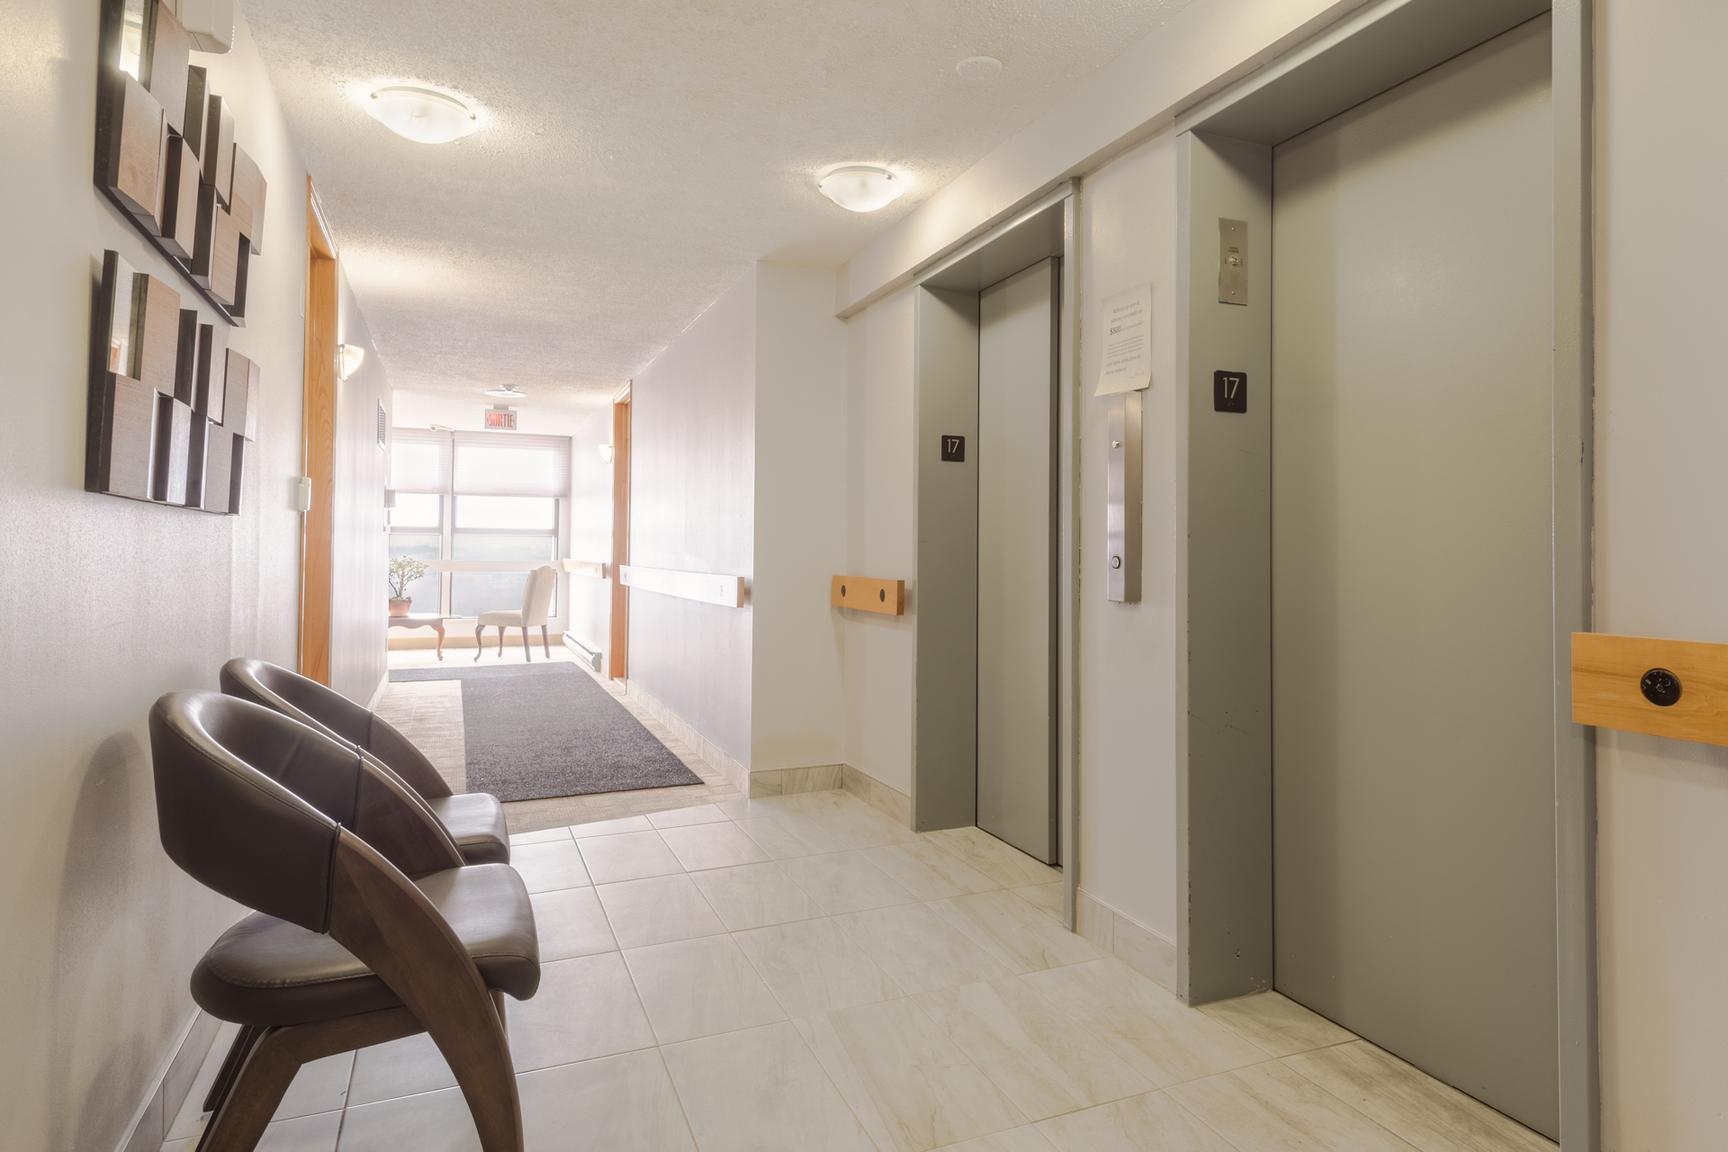 1 bedroom Apartments for rent in Laval at Le Quatre Cent - Photo 28 - RentersPages – L407184